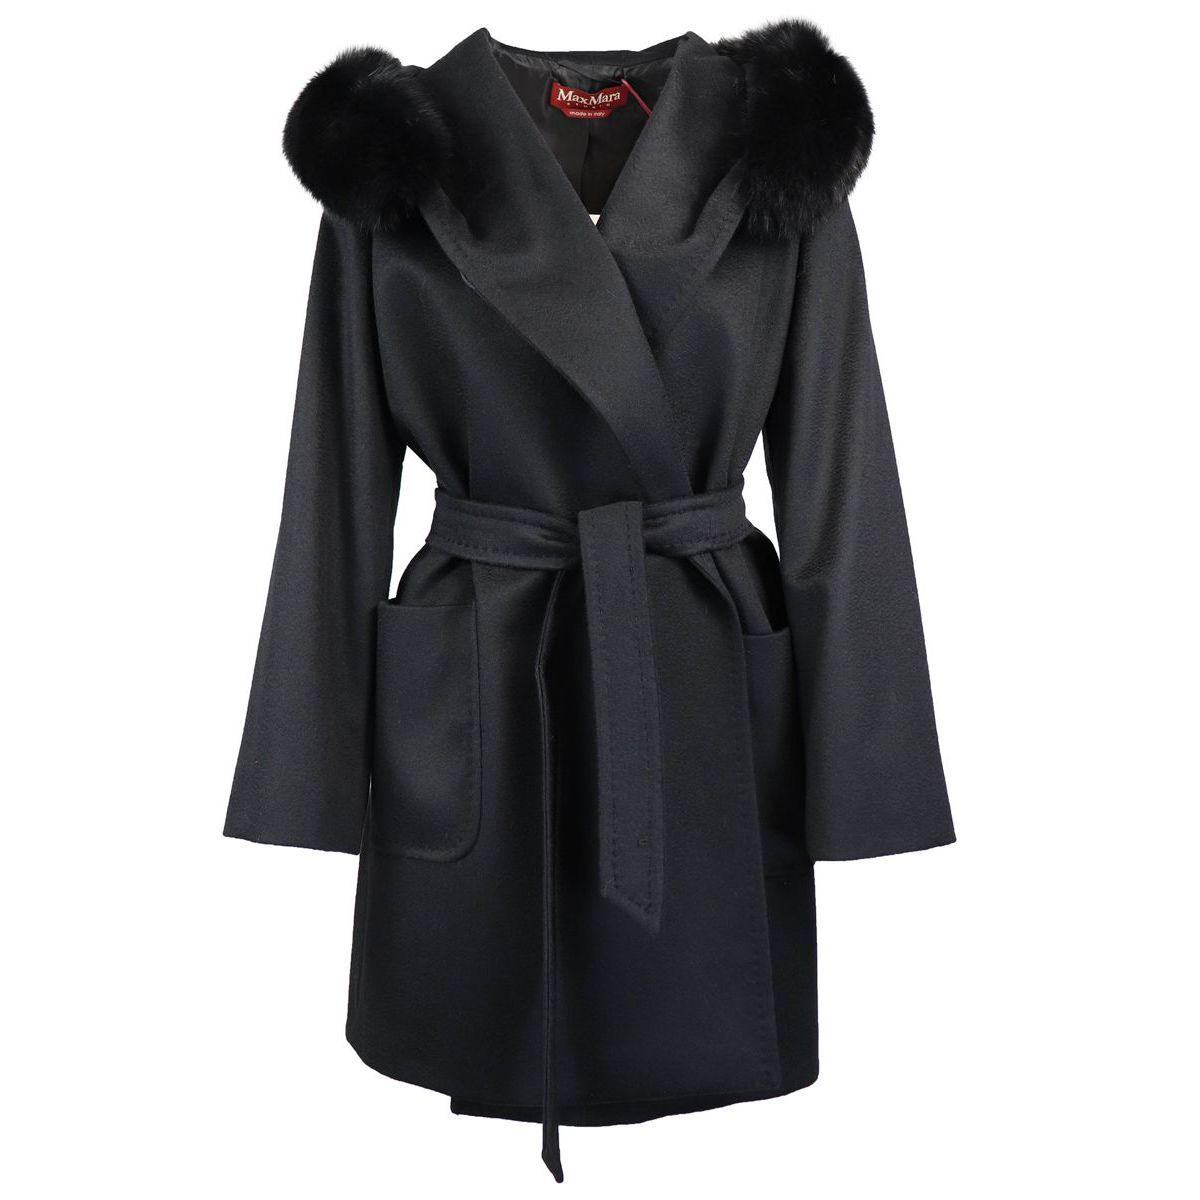 BREAK coat Black Max Mara